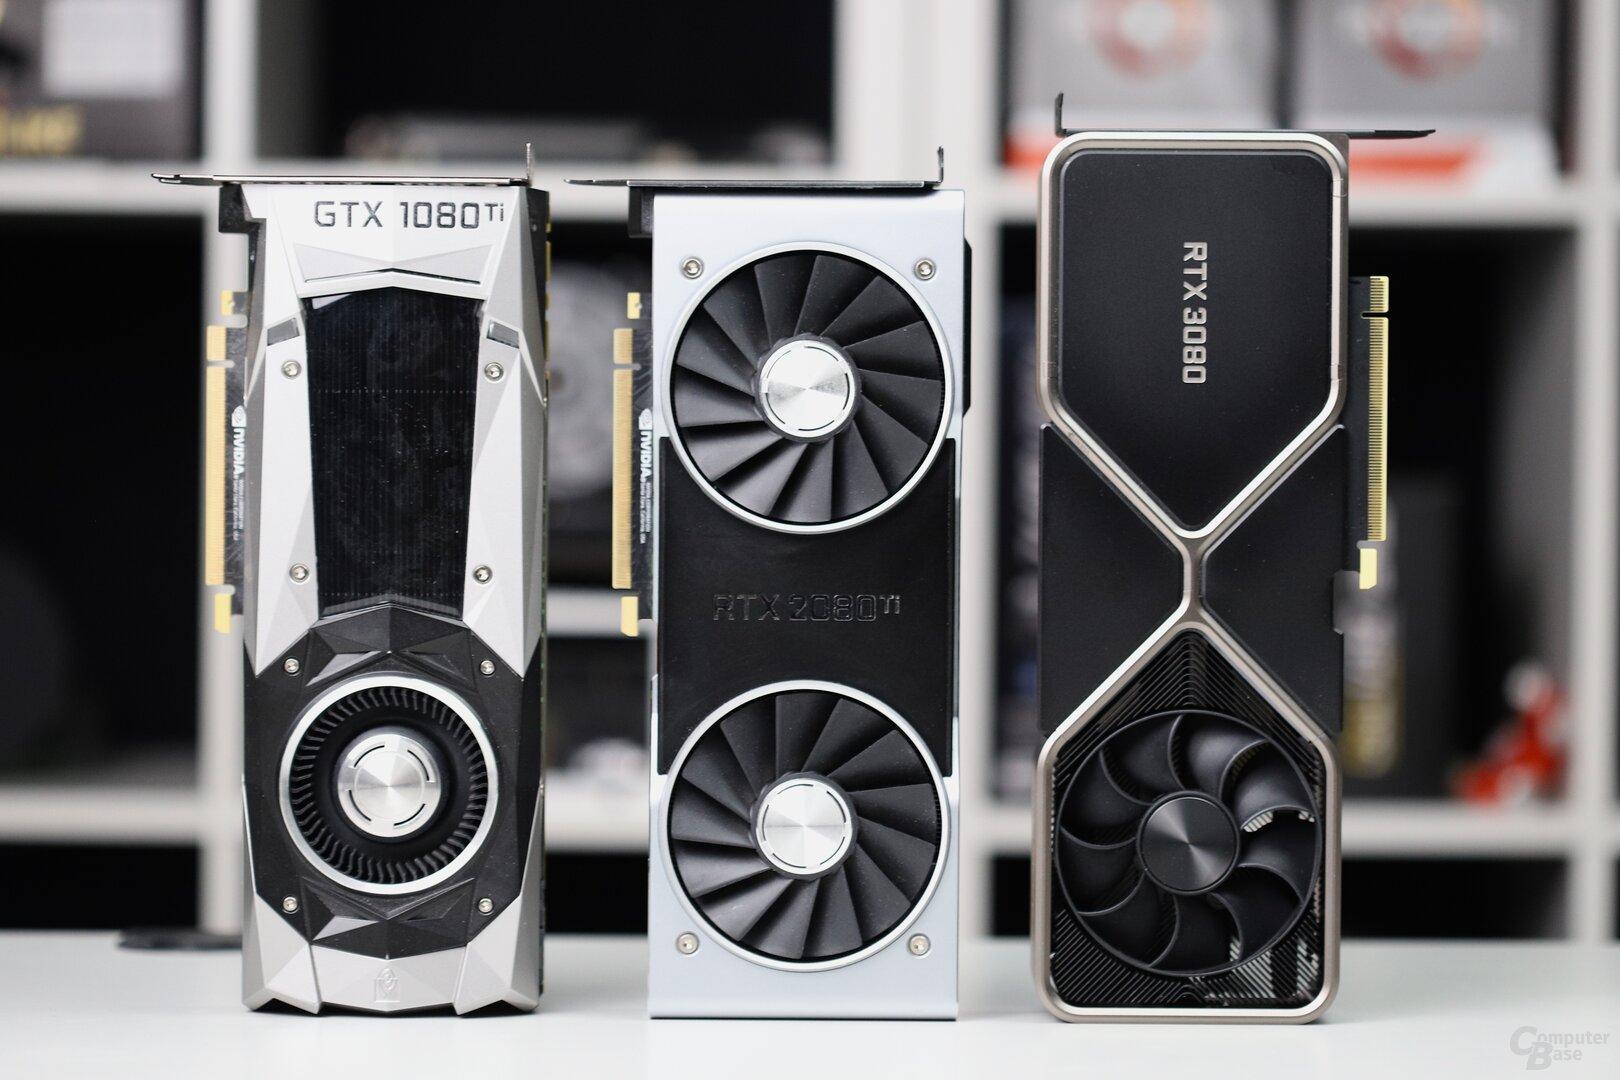 GeForce RTX 1080 Ti FE, GeForce RTX 2080 Ti FE und GeForce RTX 3080 FE